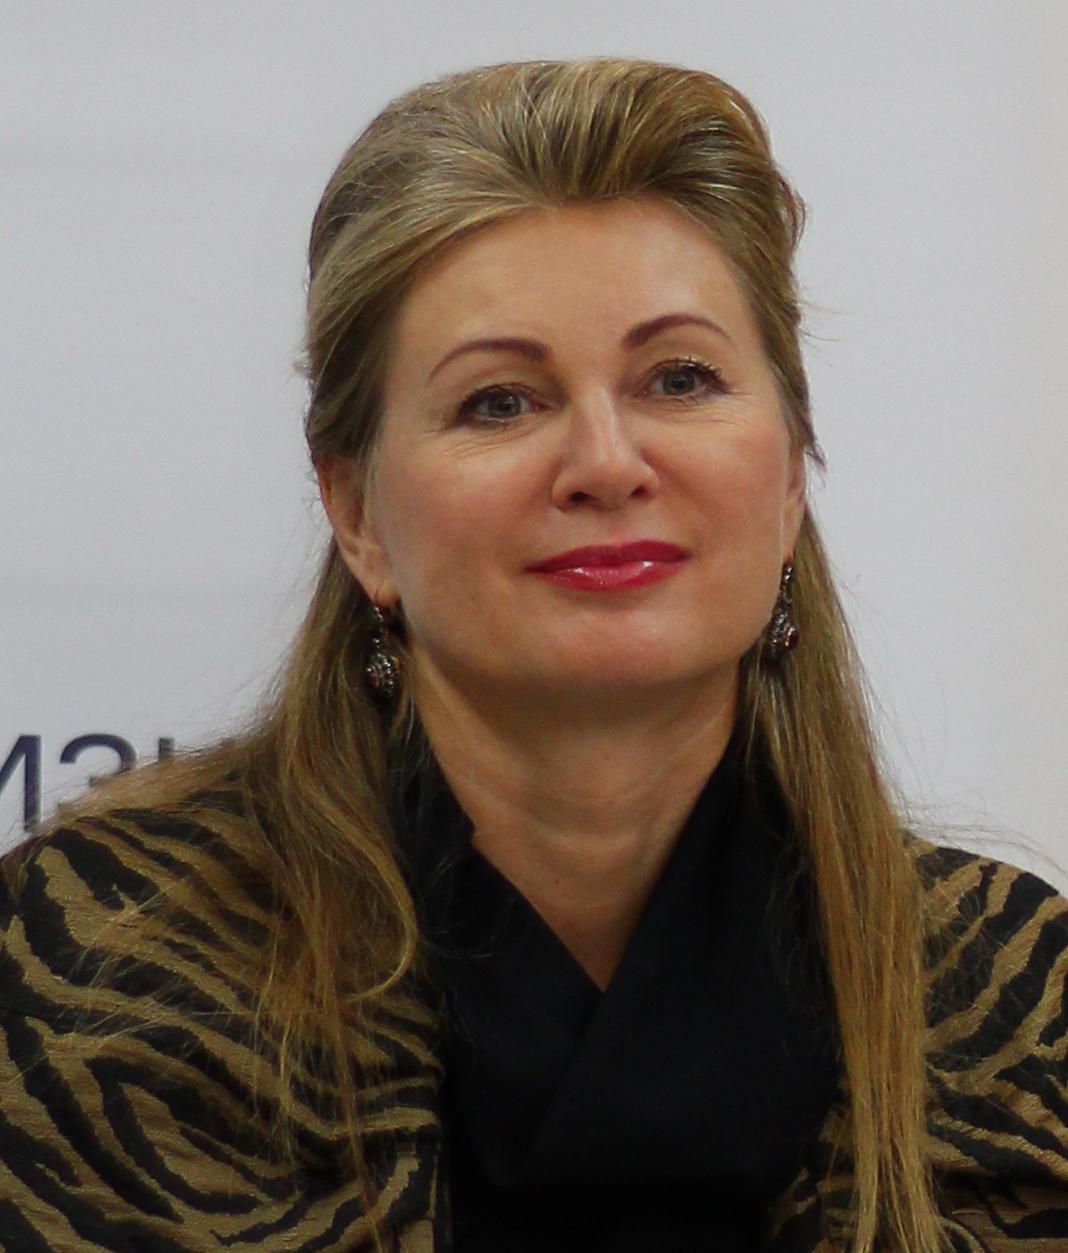 Veronika Stefankova